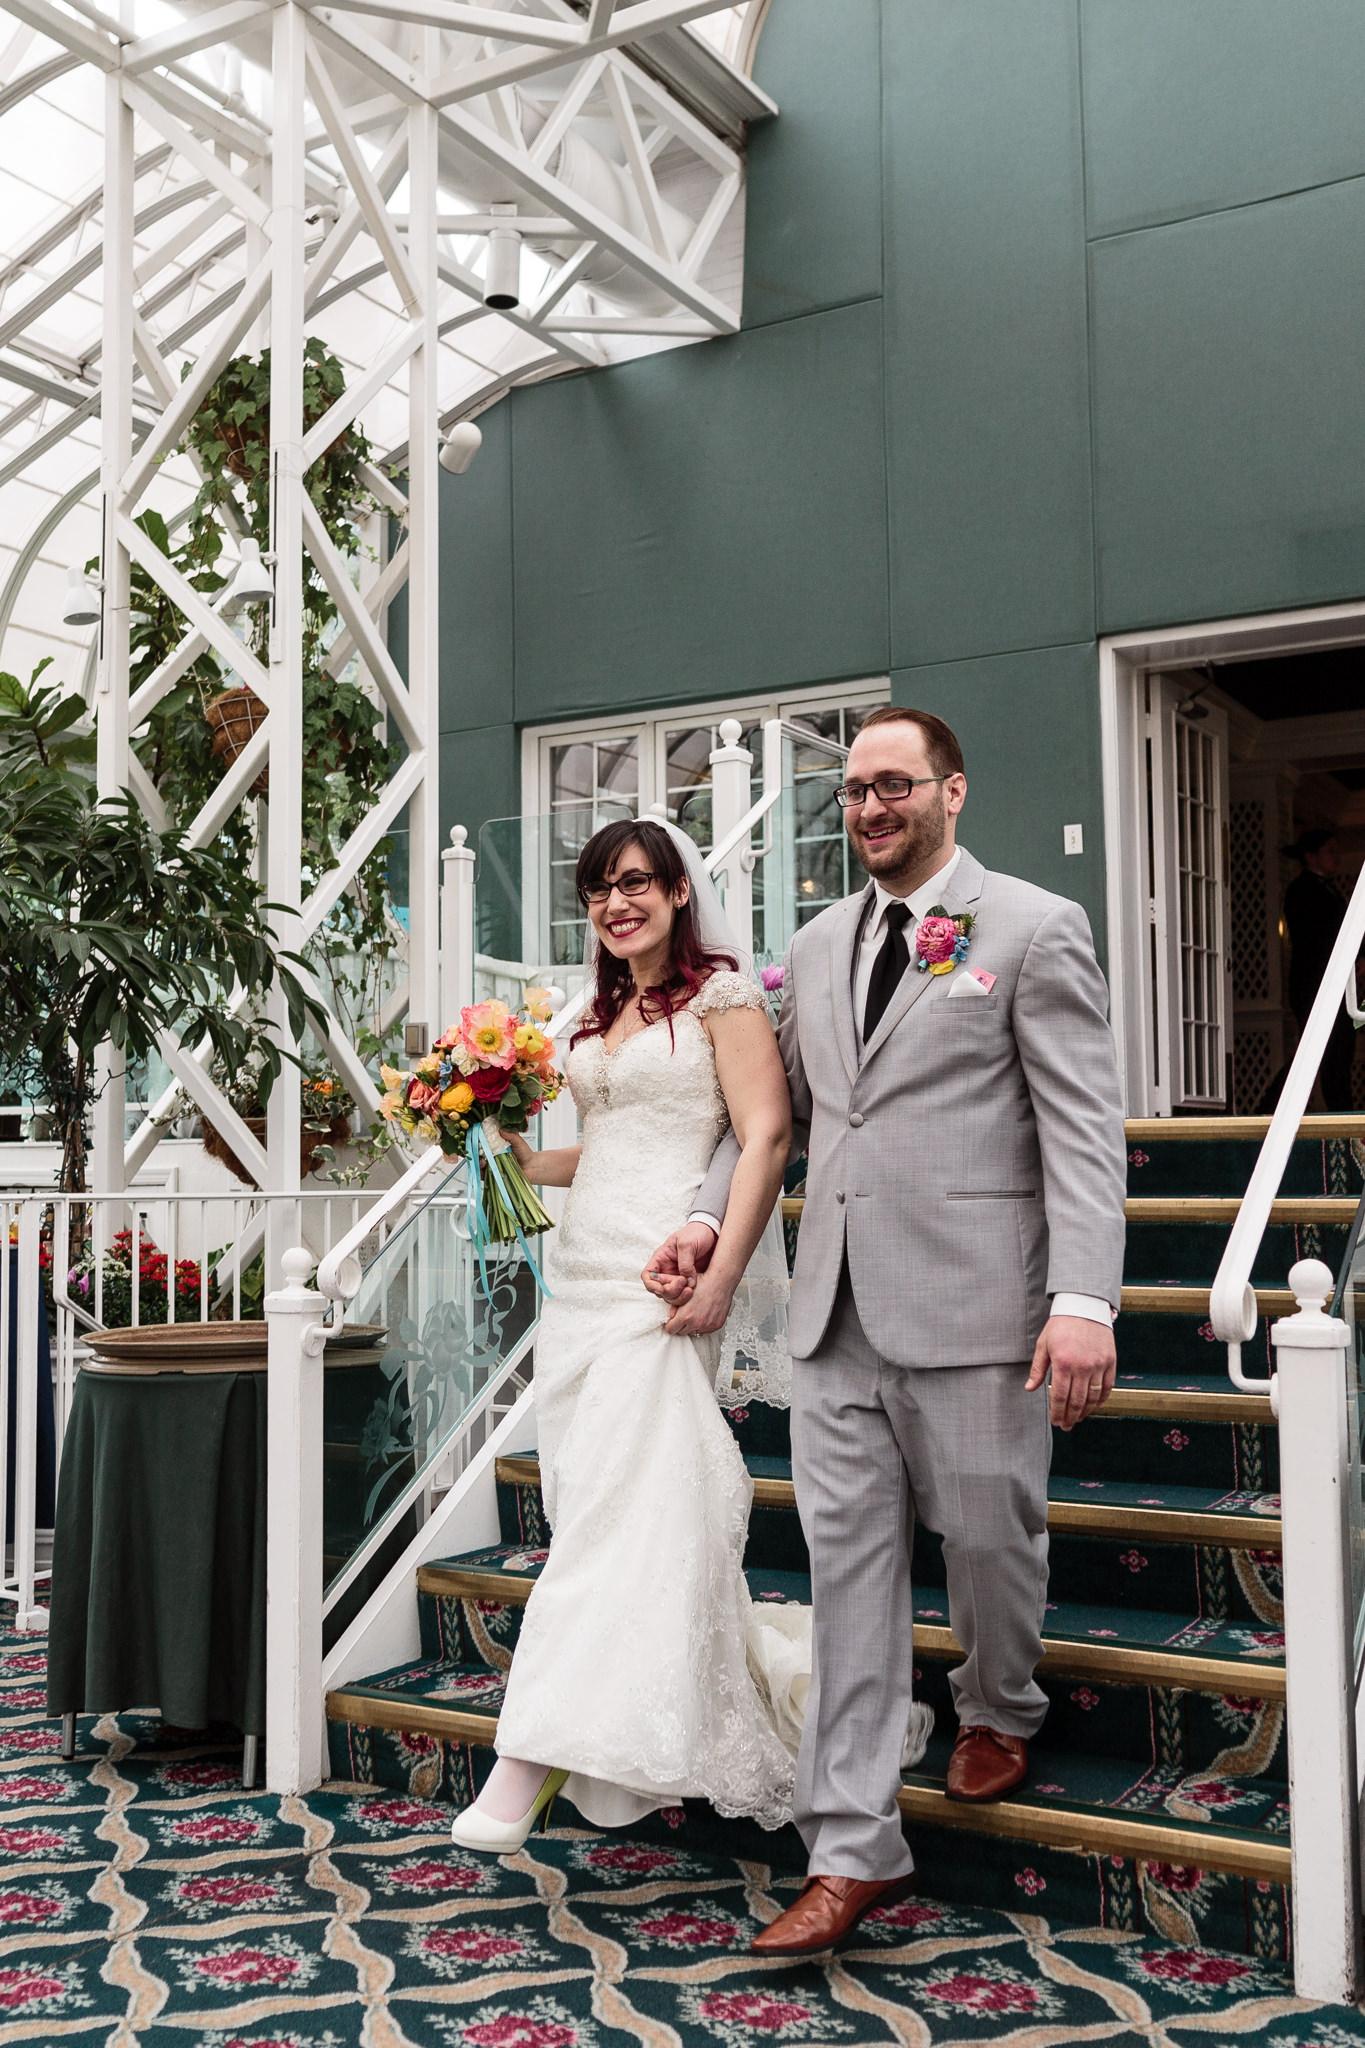 Hanchar_Madison_Hotel_NJ_Wedding_2C0A8003.jpg